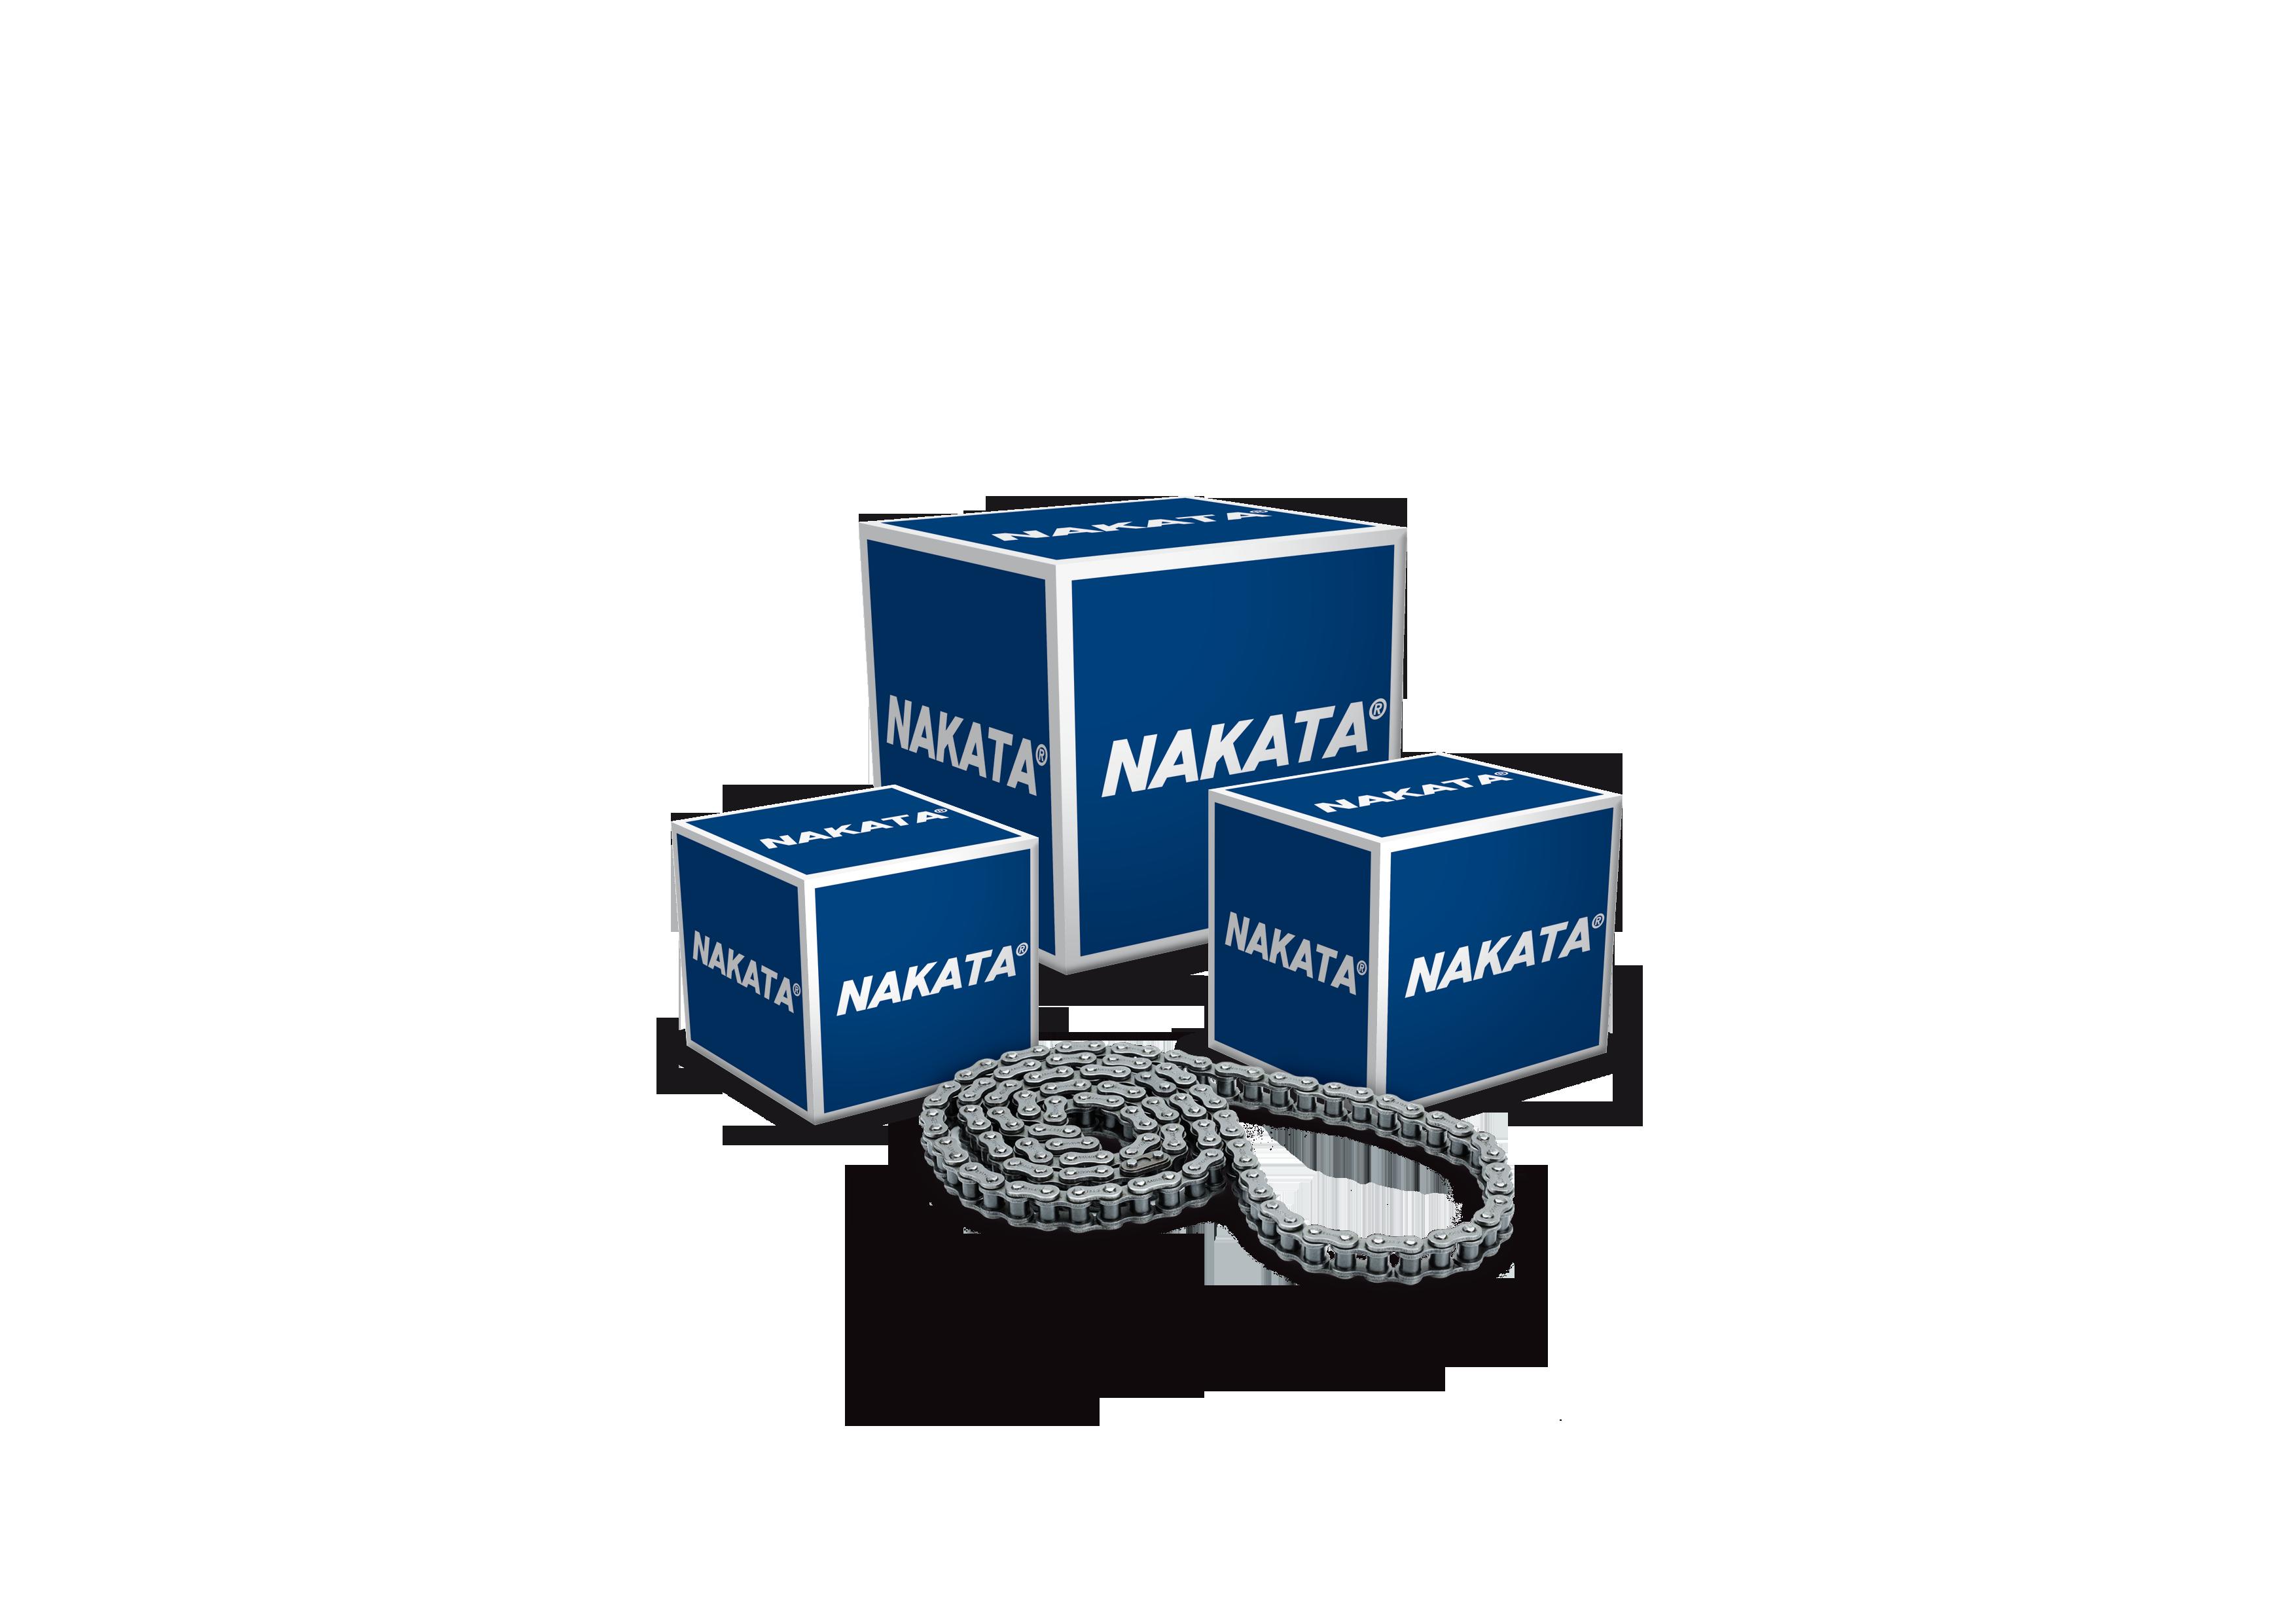 Nakata lança correntes para motocicletas